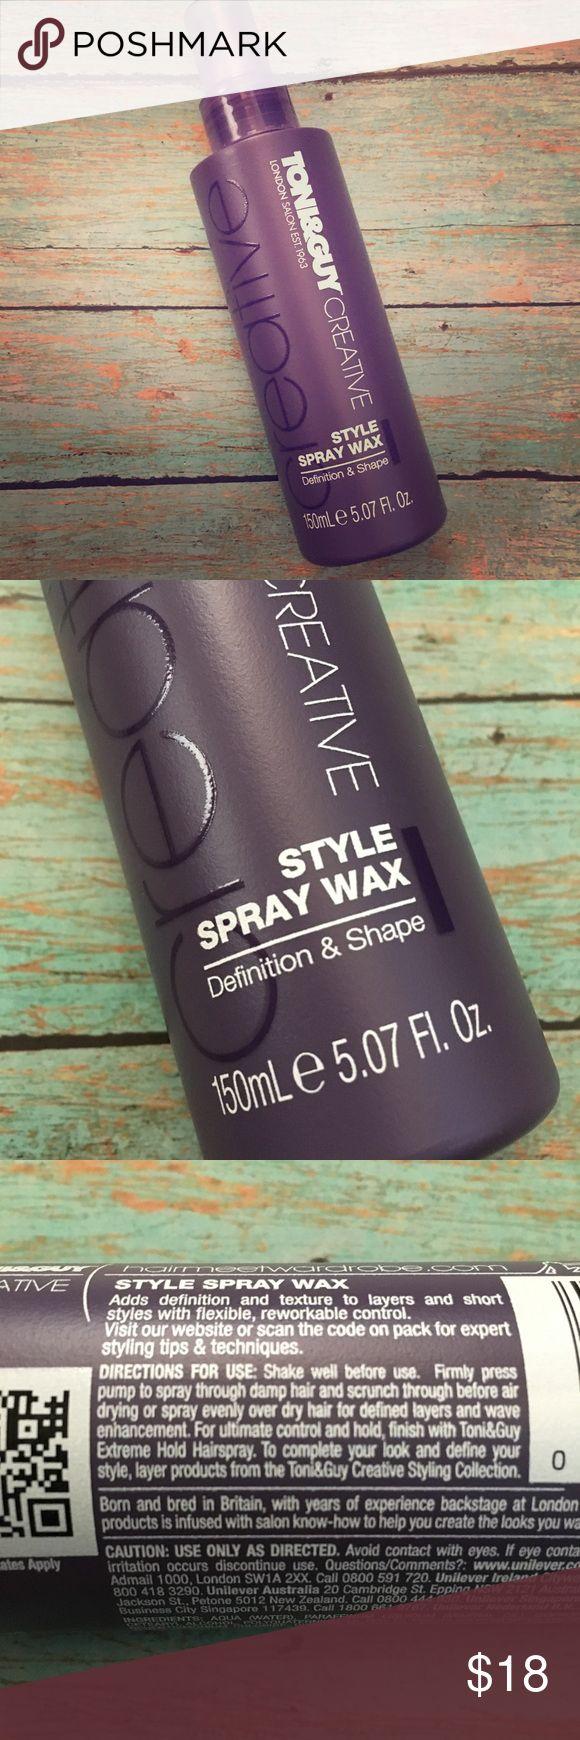 Style Spray Wax New Toni & Guy spray wax. Adds definition and texture. 5.07 Oz spray bottle. Toni & Guy Makeup